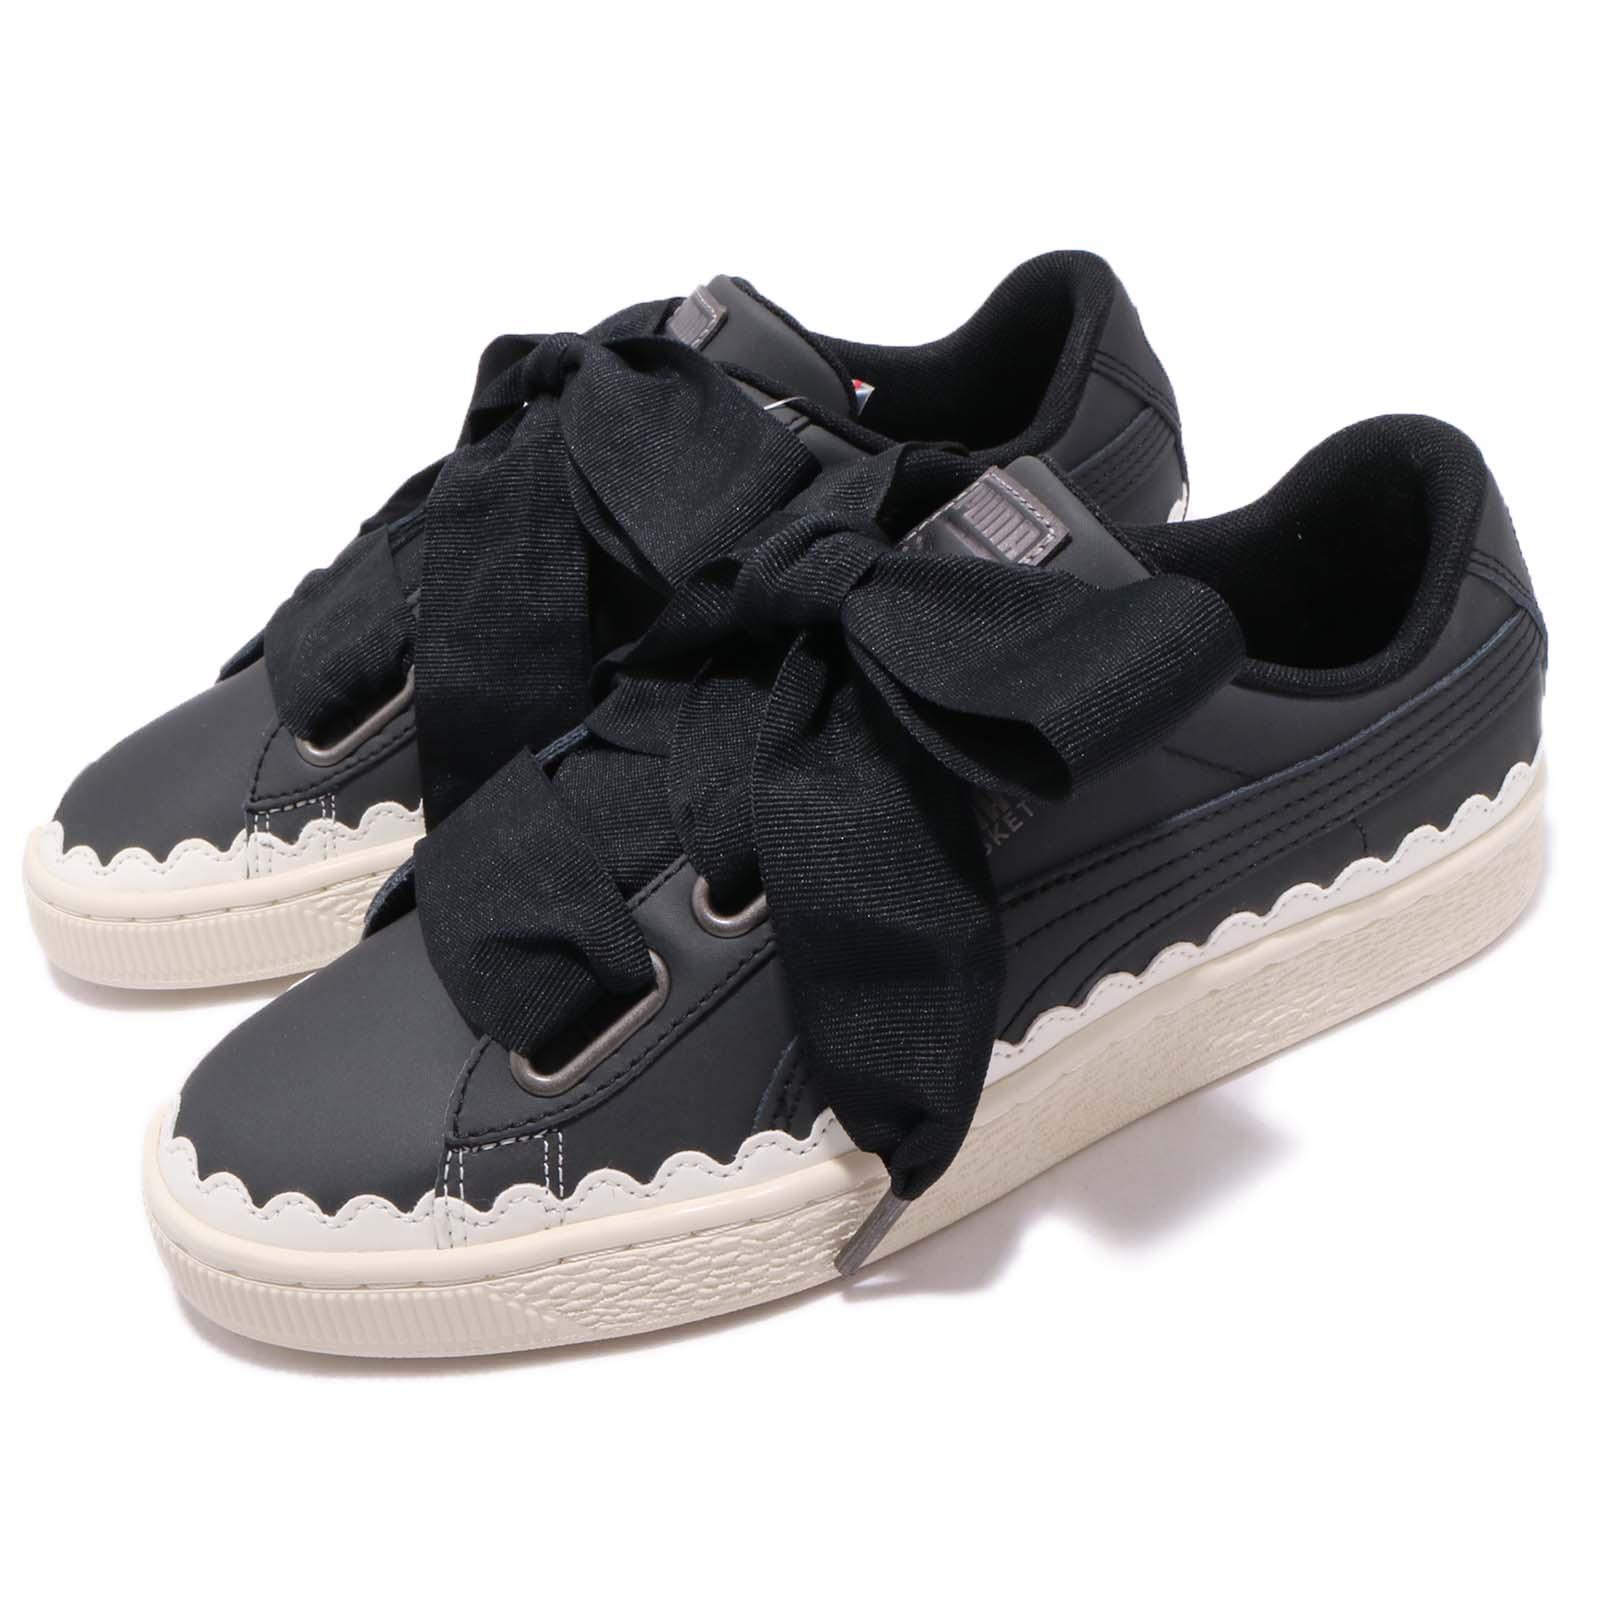 Puma 休閒鞋 Basket Heart 女鞋 36697903